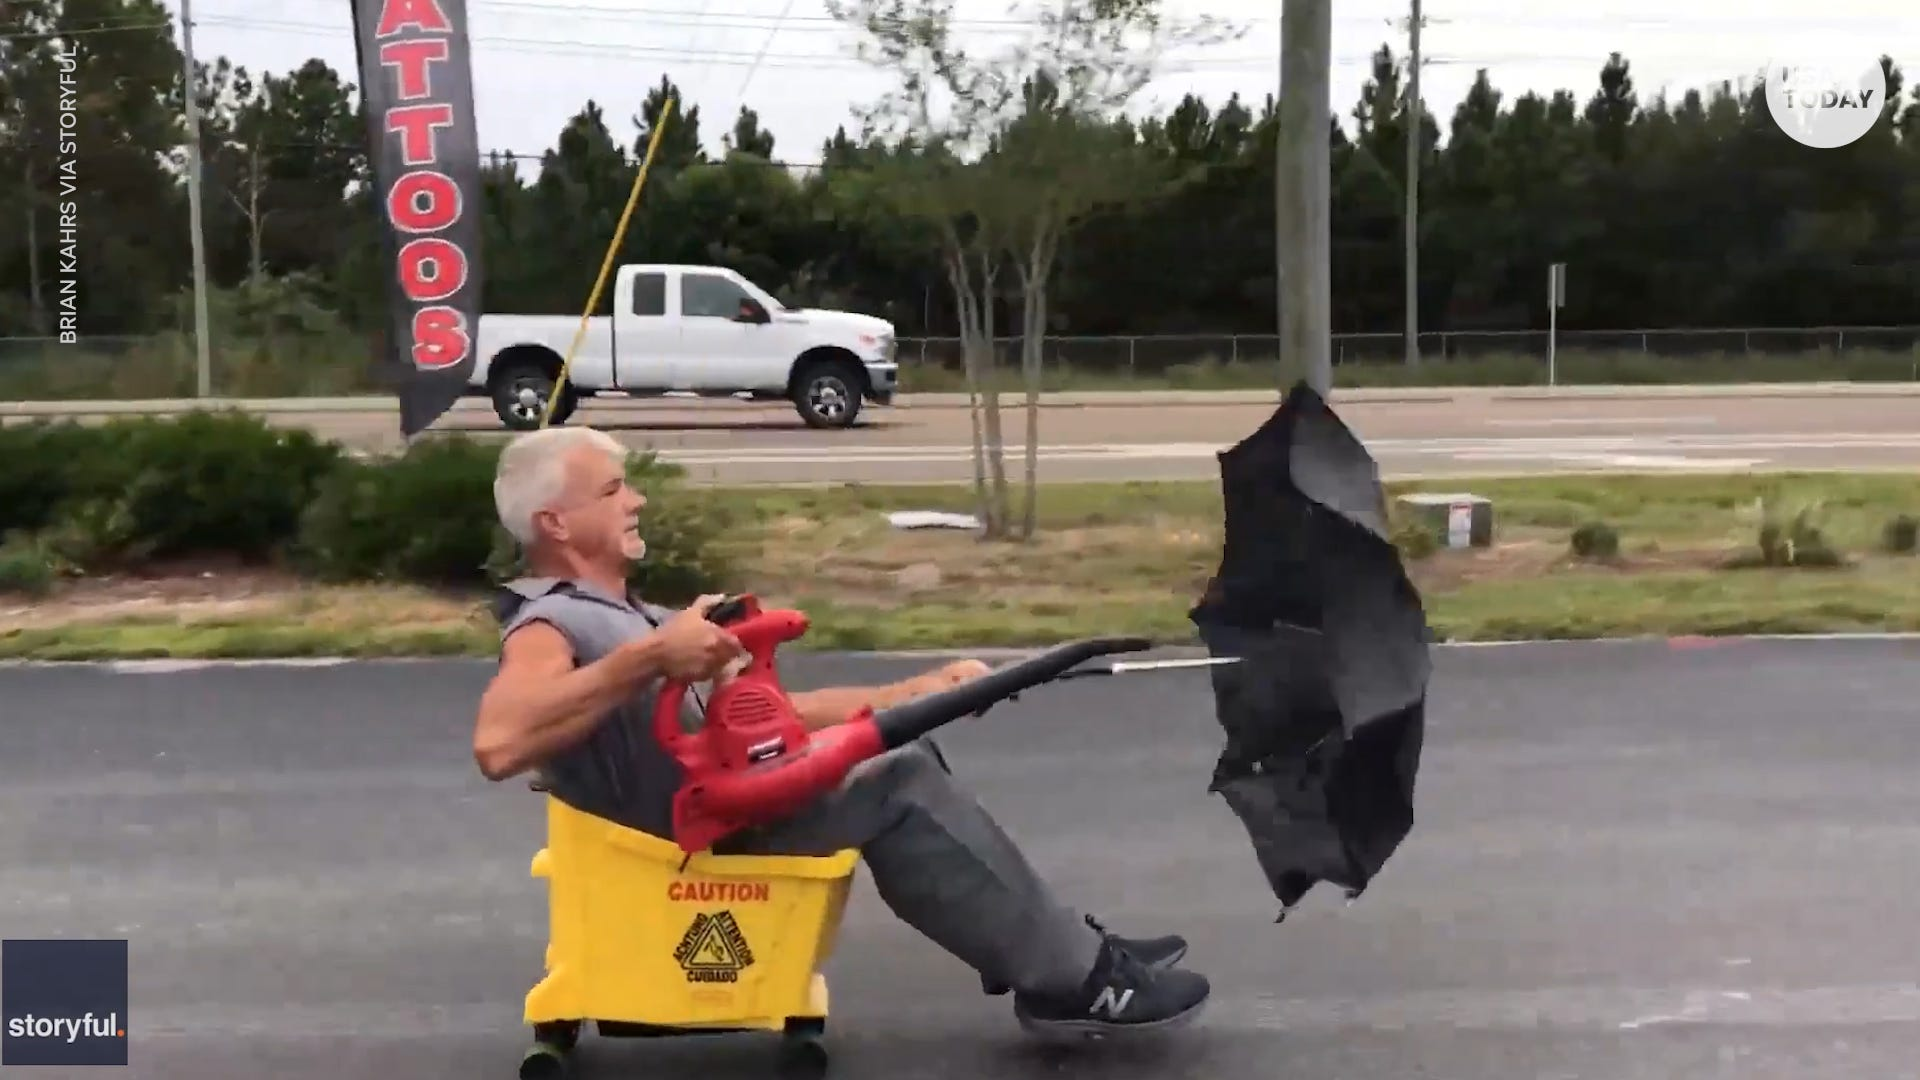 Man makes 'blue collar limousine' using a leaf blower, umbrella and mop bucket